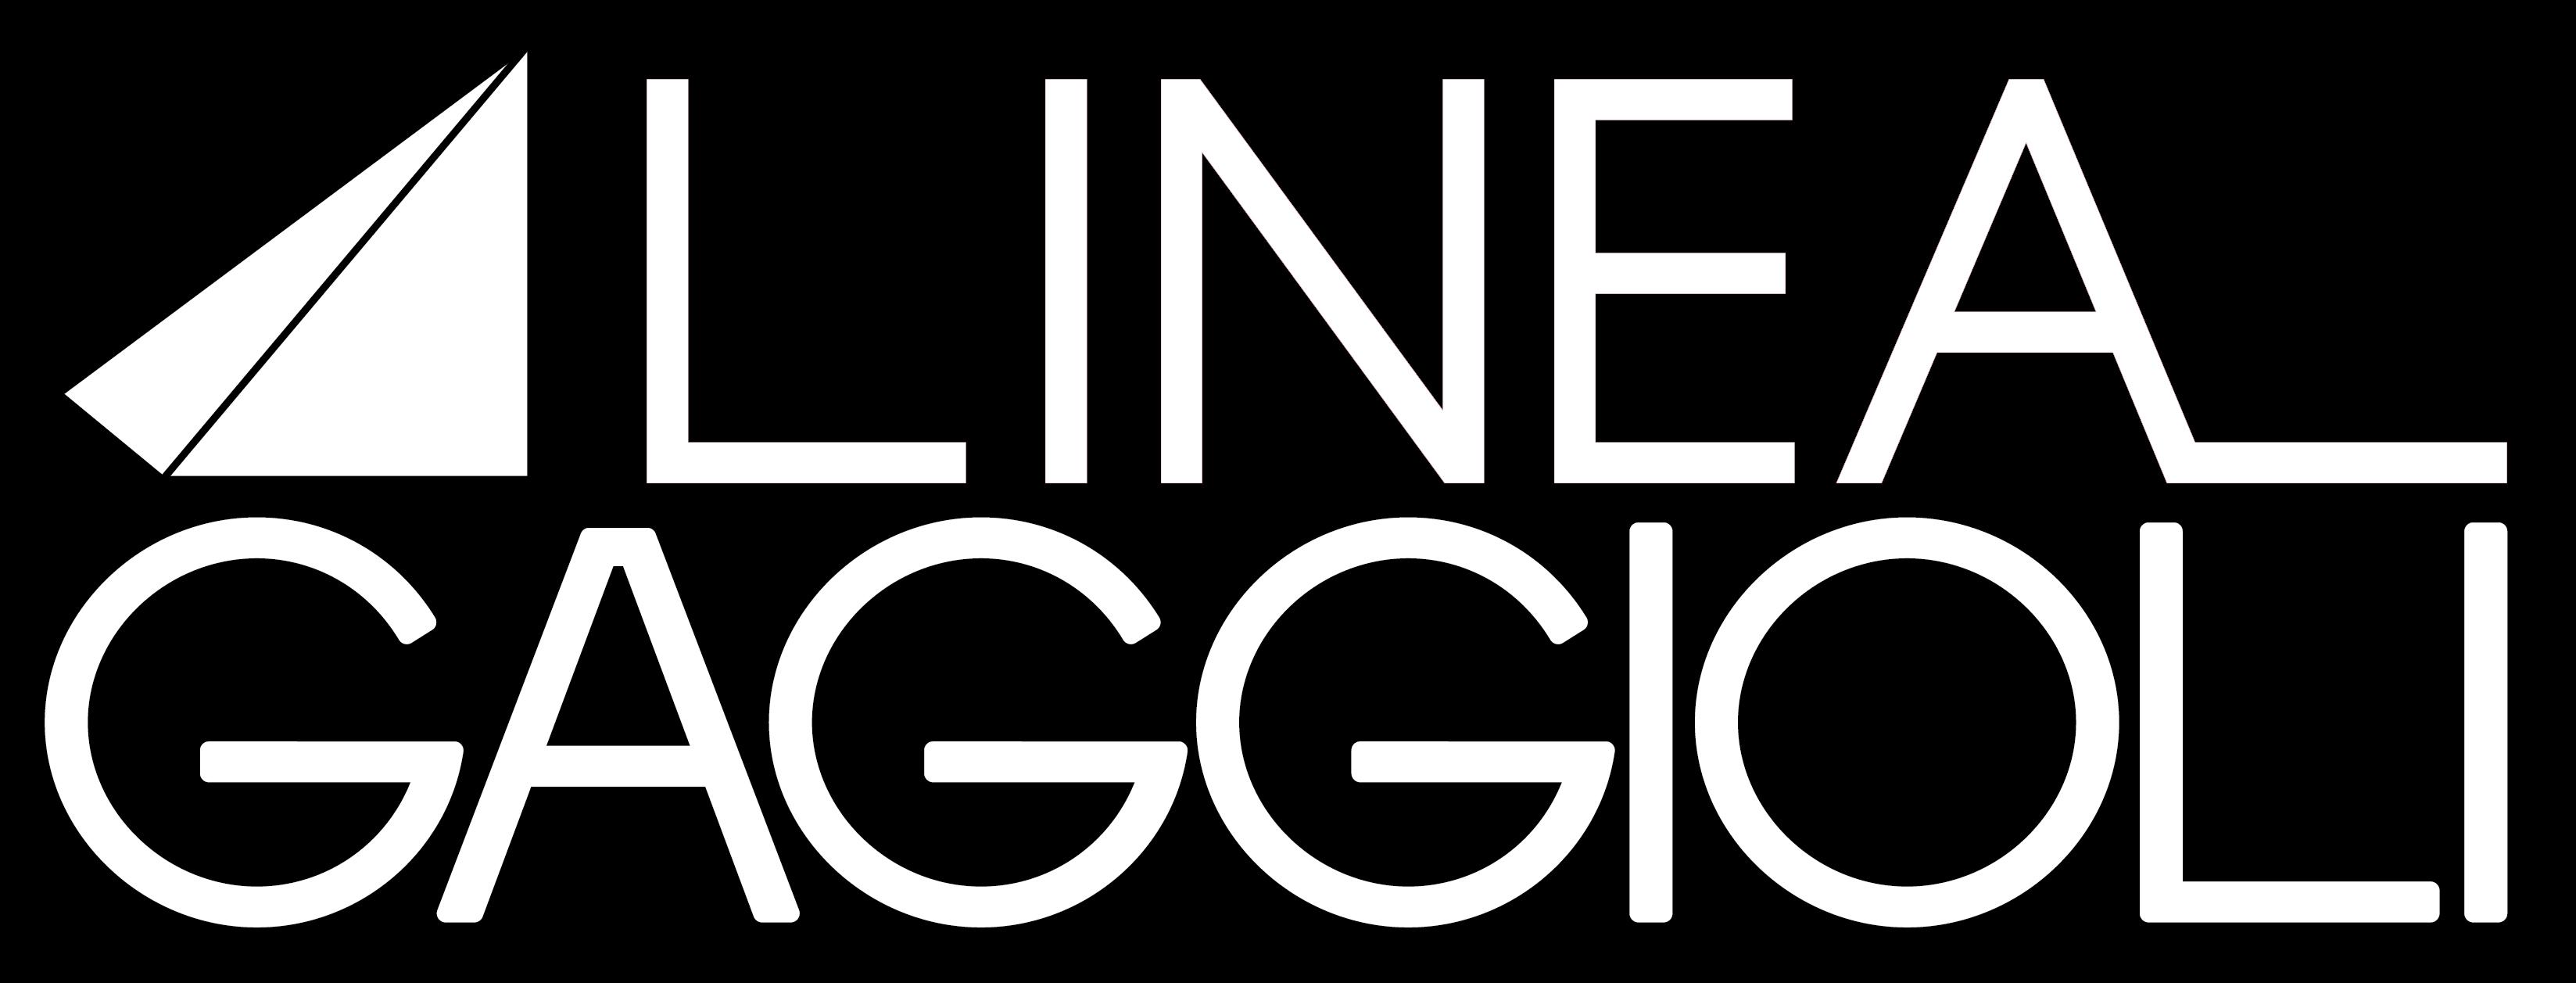 Linea Gaggioli Logo